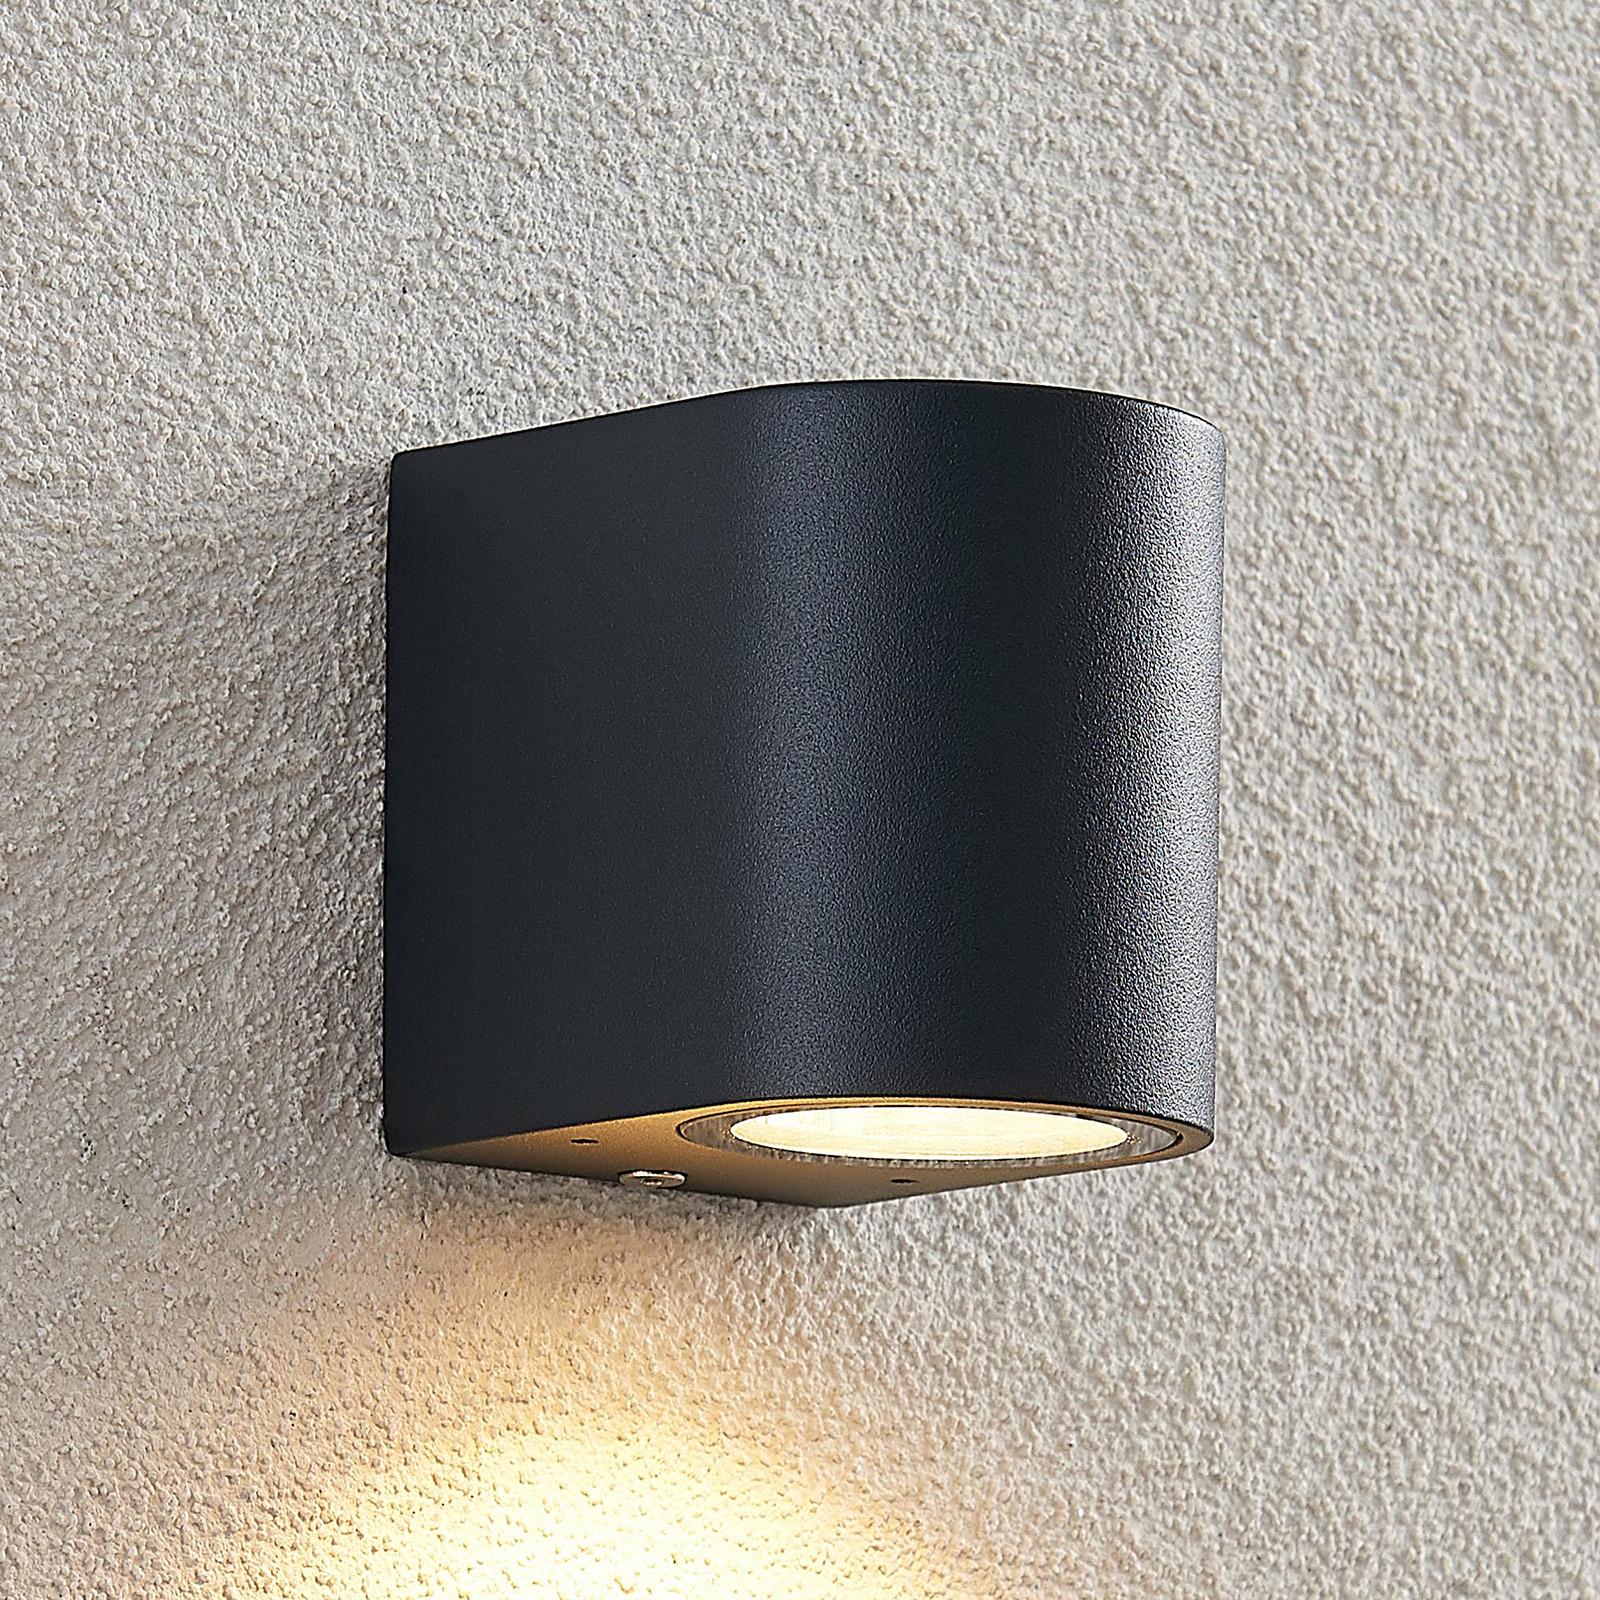 ELC Fijona LED outdoor wall lamp, round, 8.1 cm_9950873_1